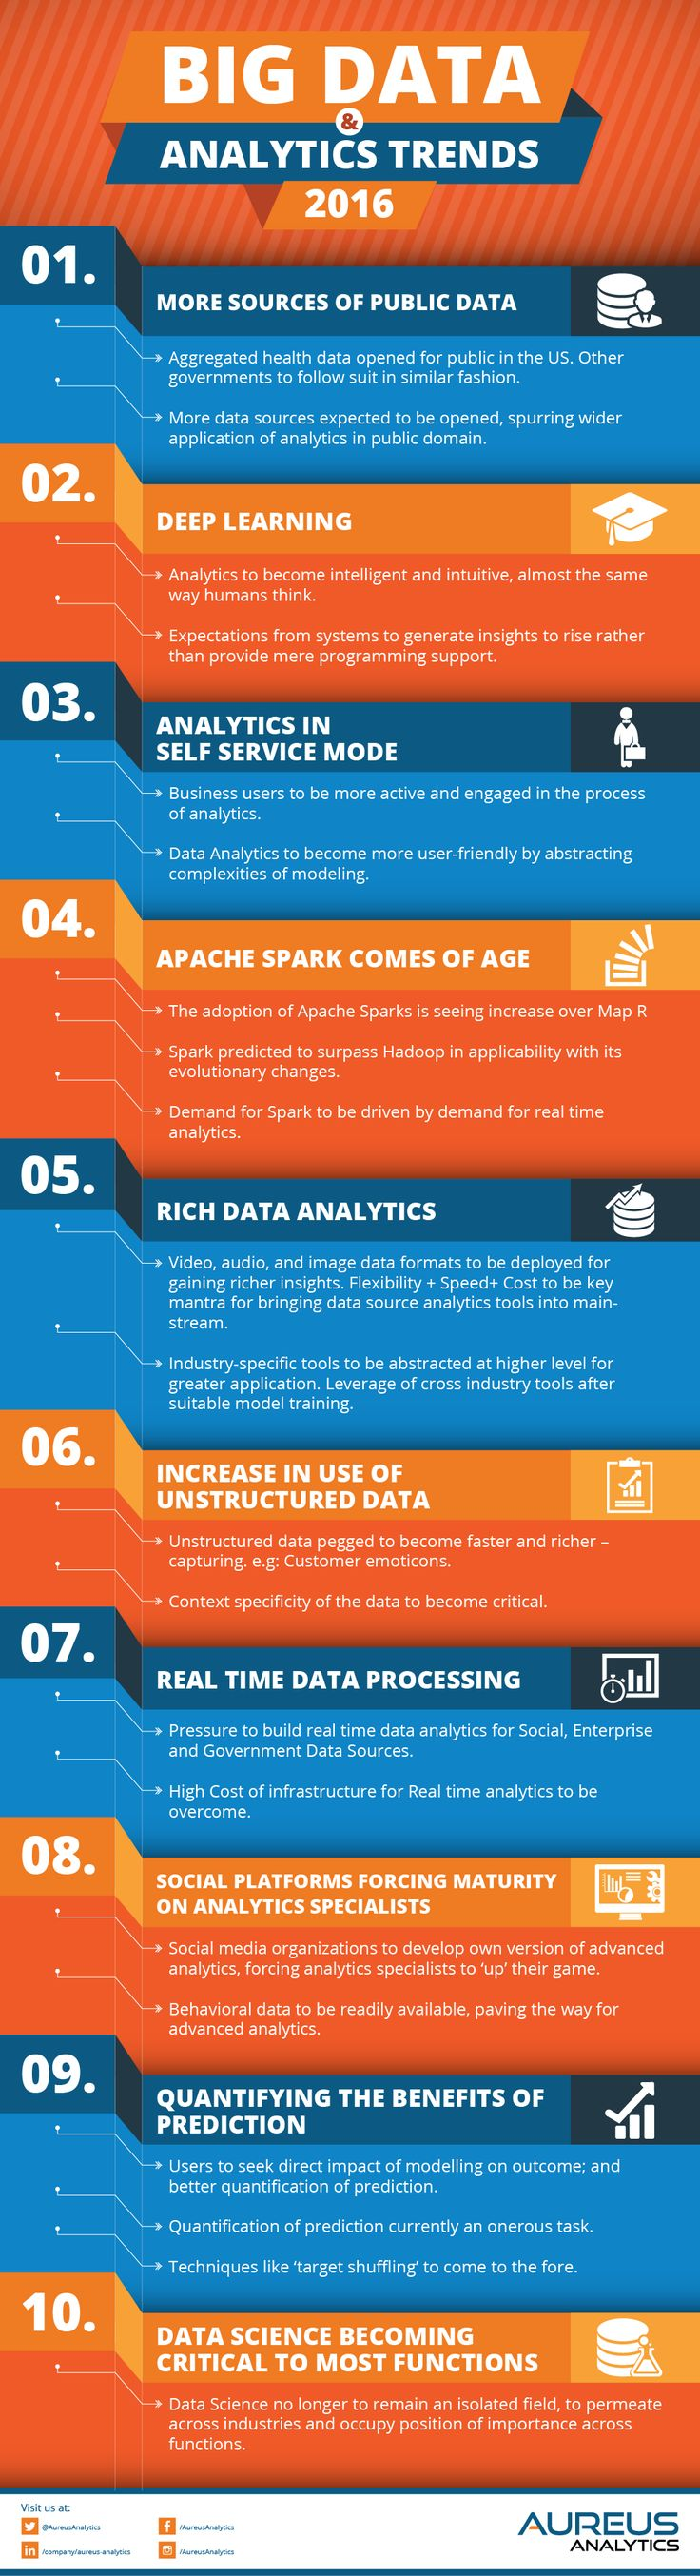 Big-Data-Analytics-Trends-2016